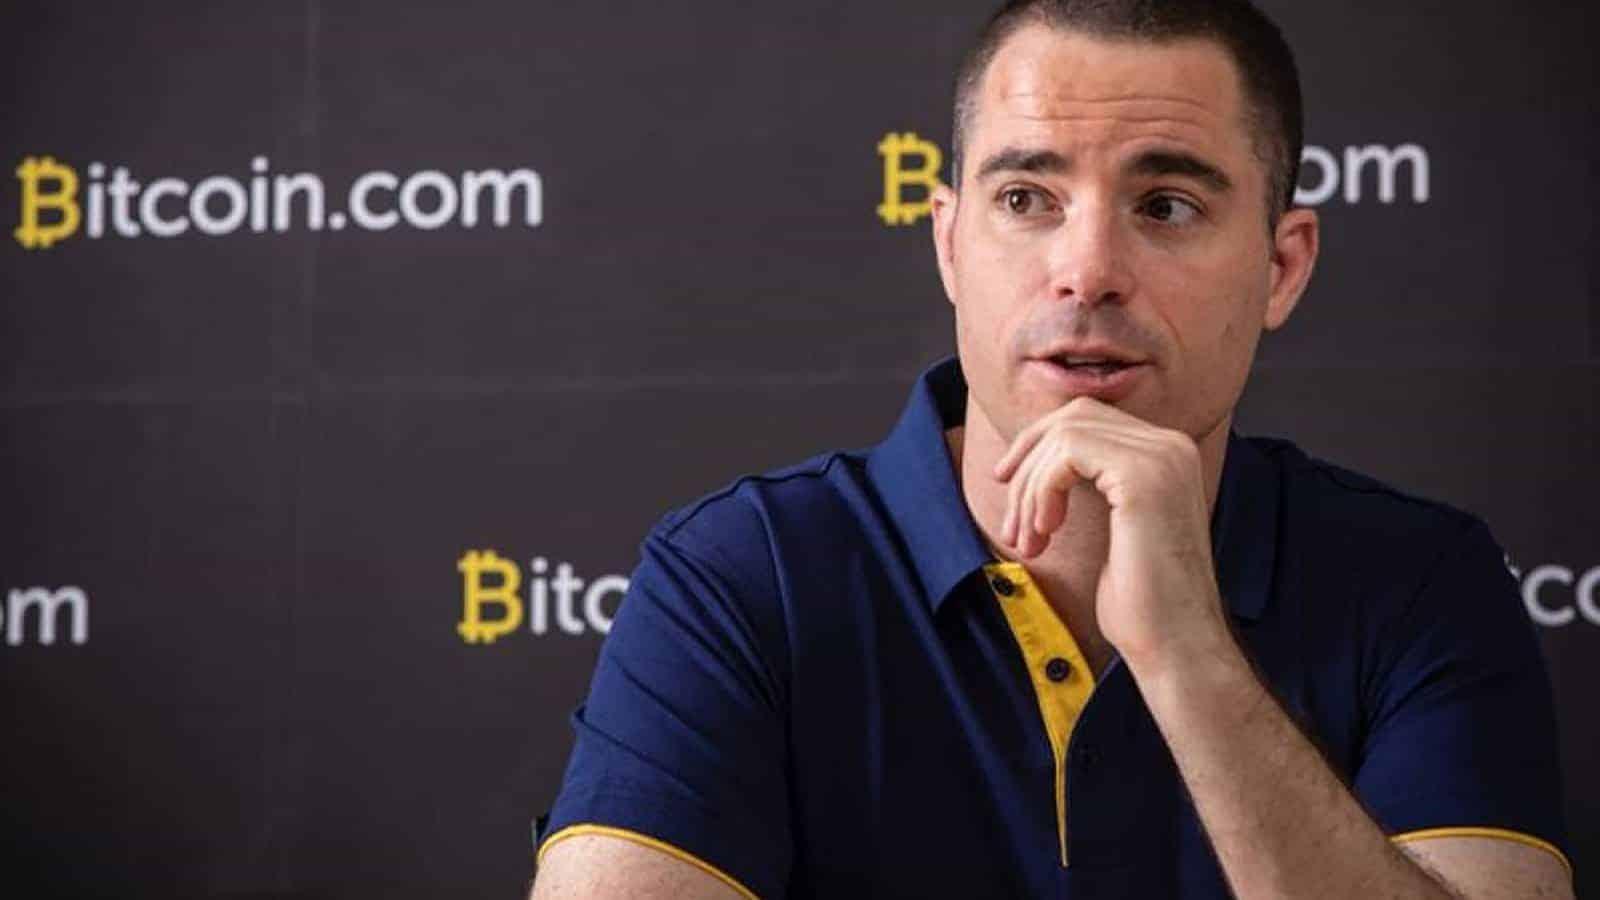 Roger Ver in a presentation of Bitcoin Cash and Bitcoin.com